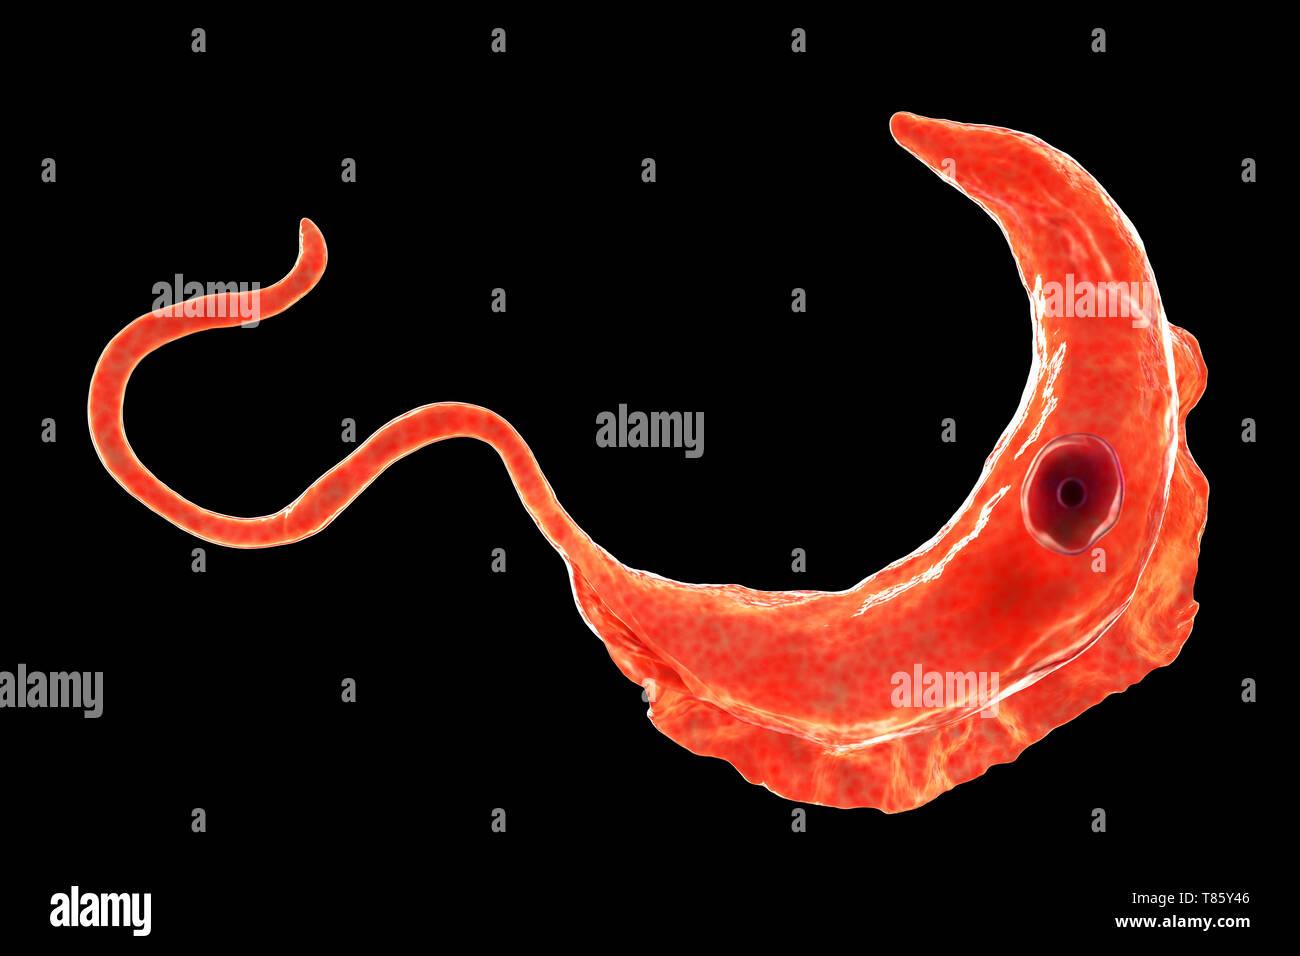 Sleeping sickness parasite, illustration - Stock Image